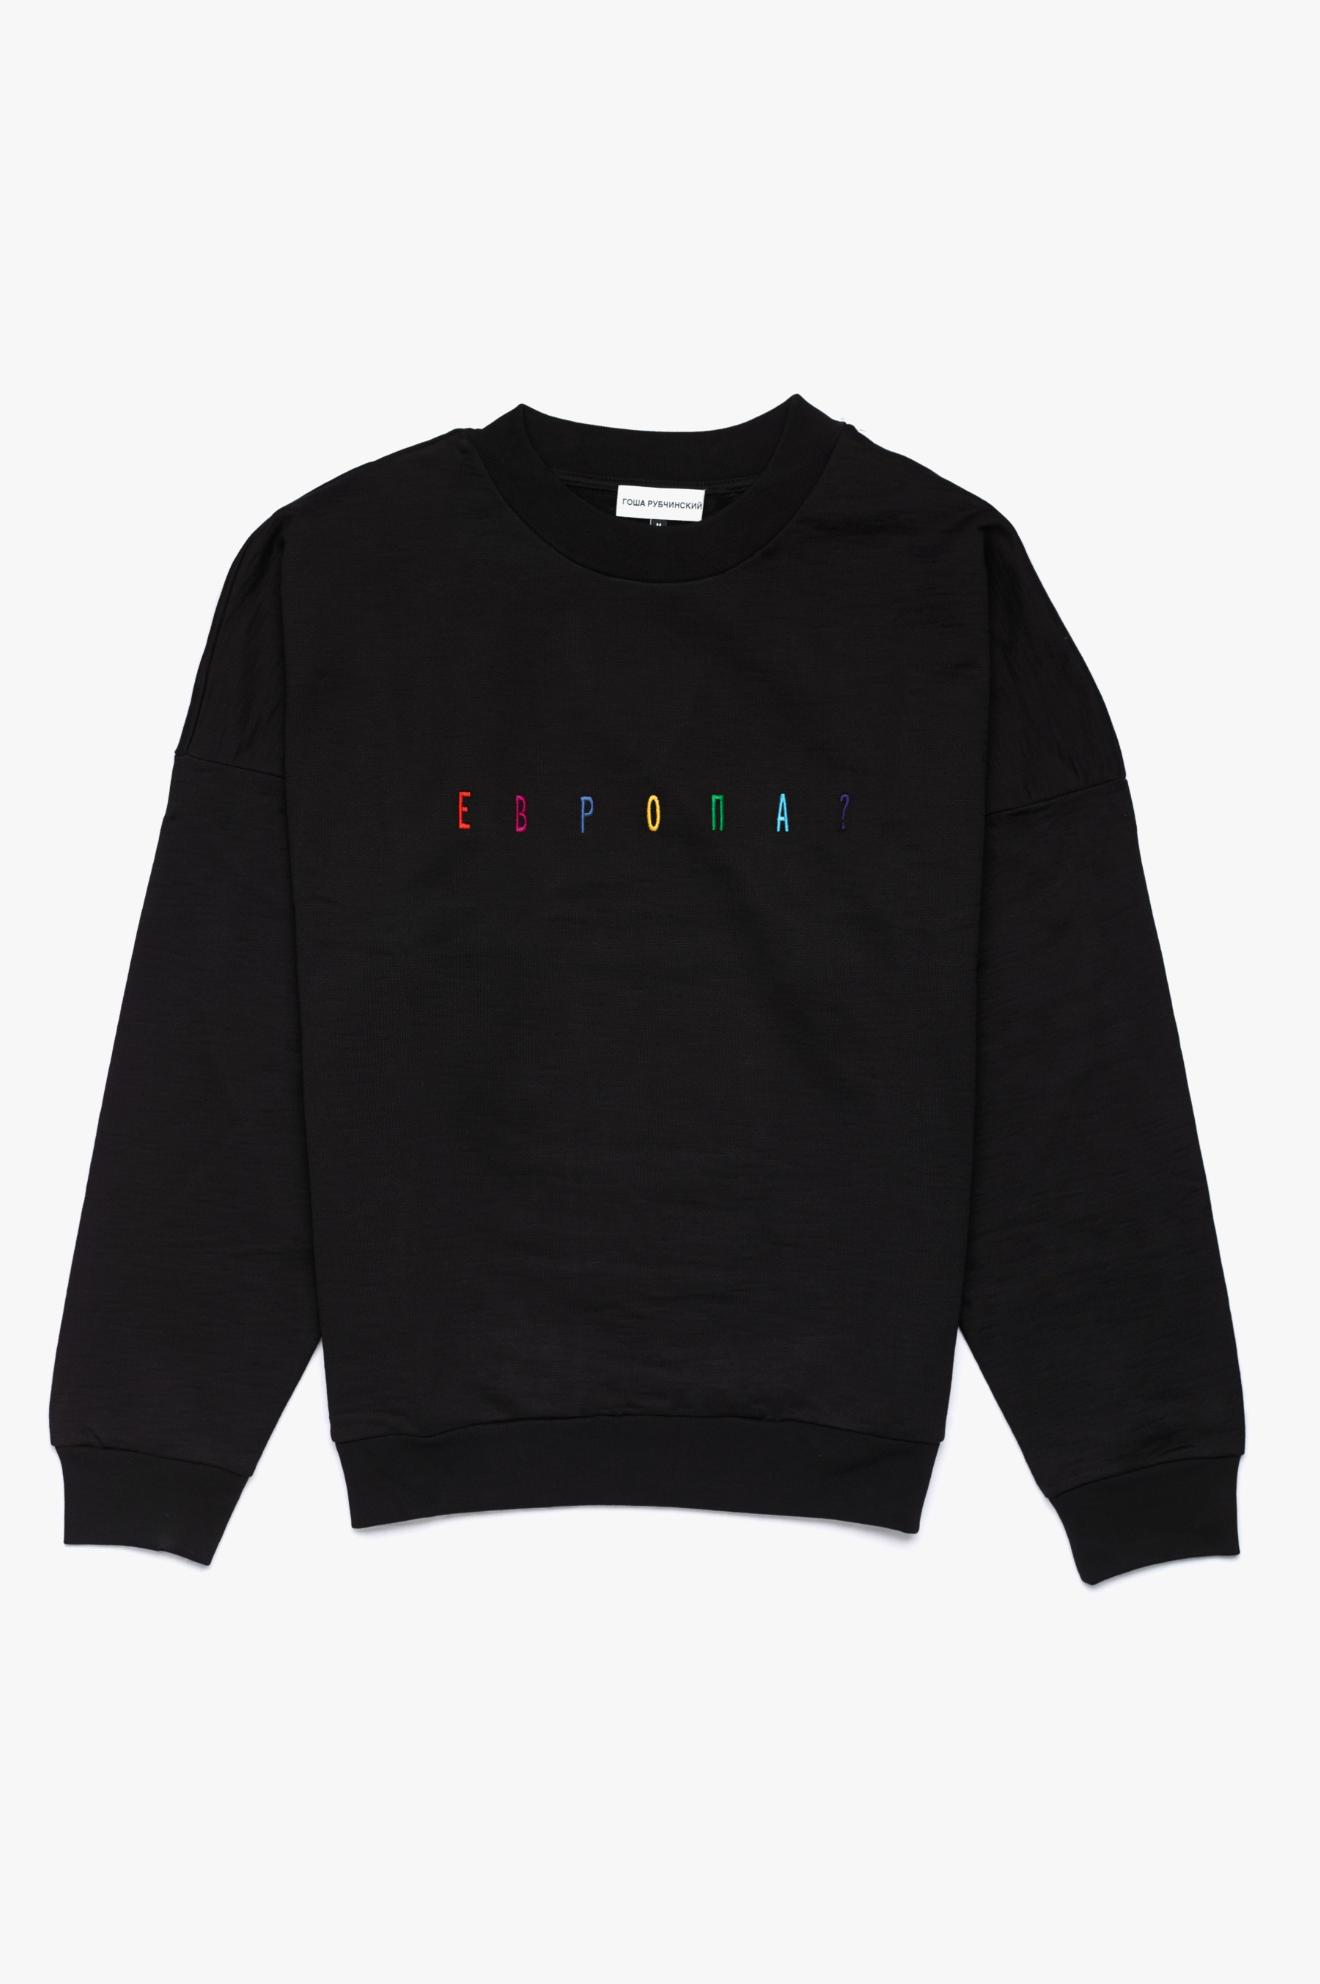 Europa? Sweatshirt Black